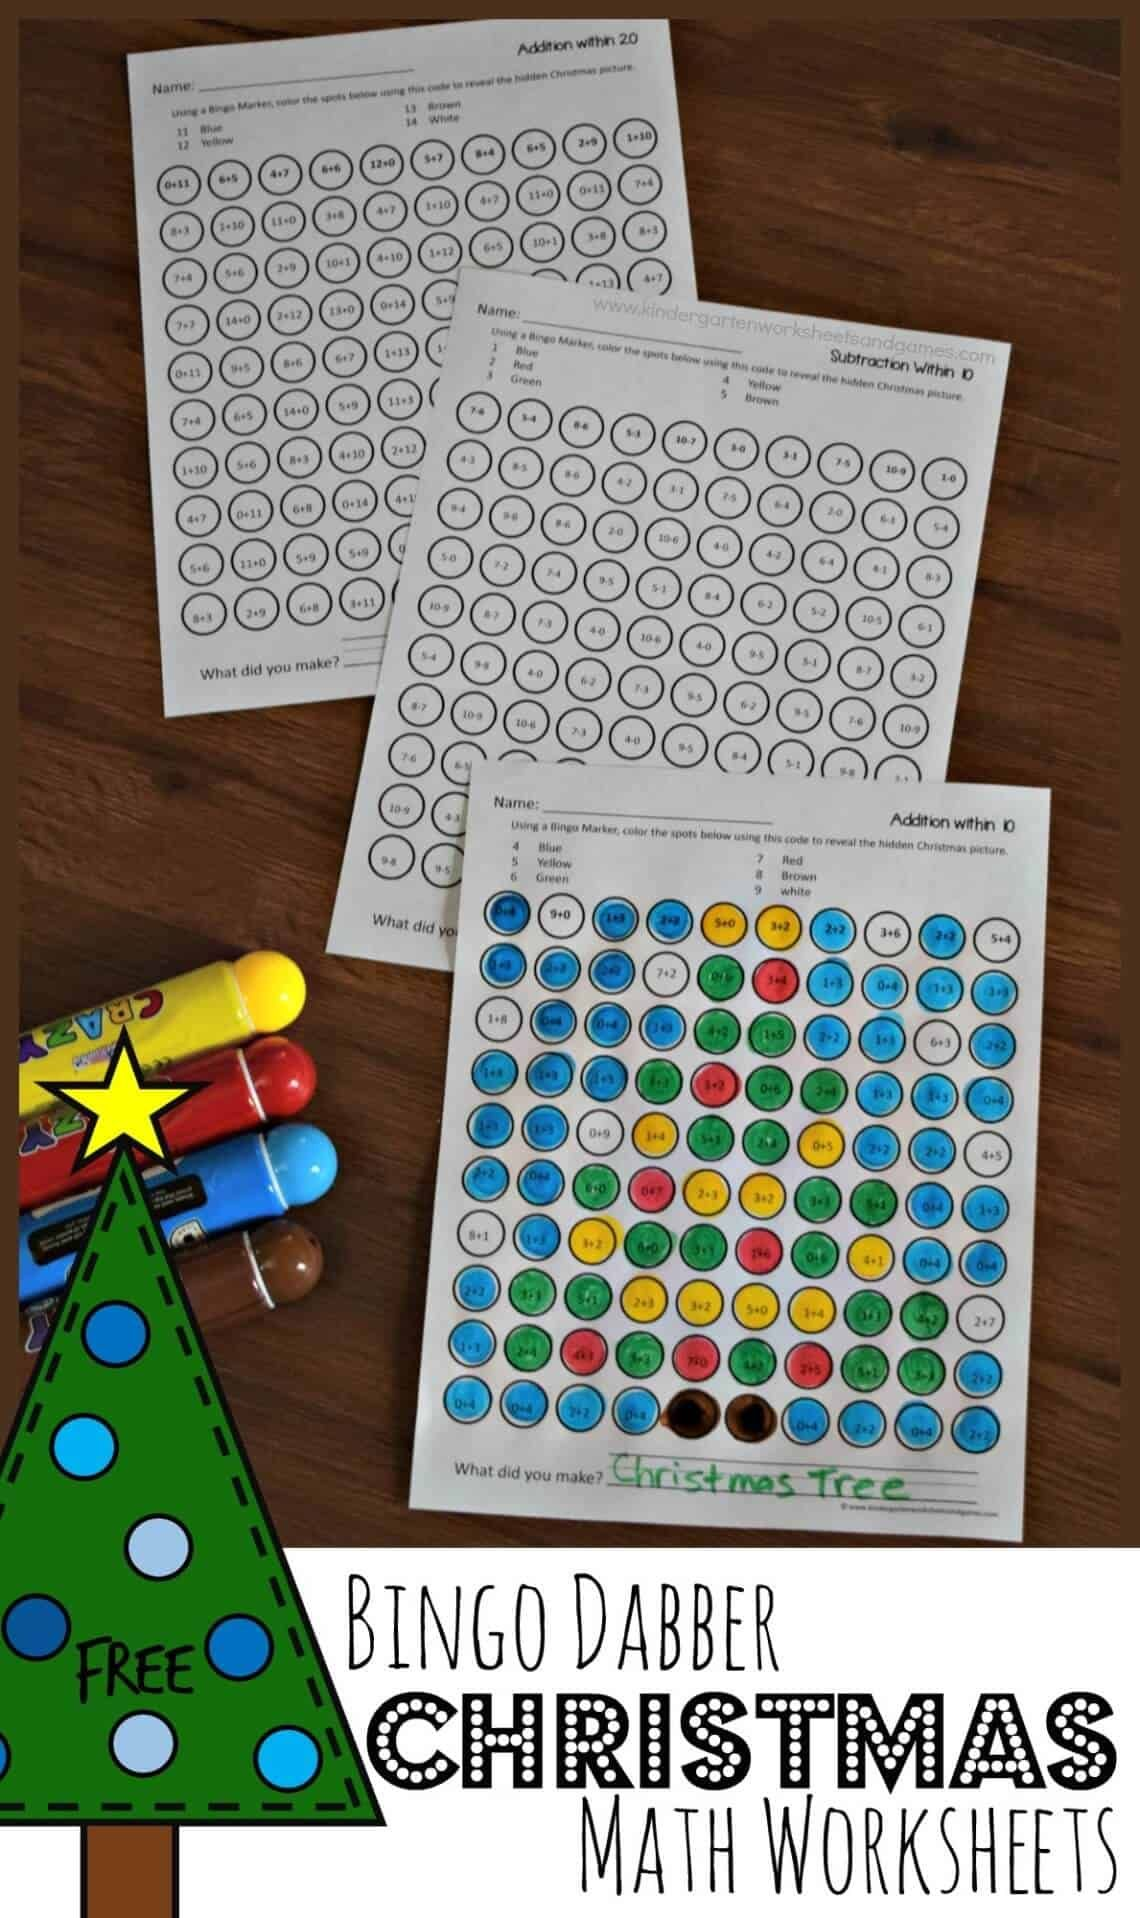 Free Bingo Dabber Christmas Math Worksheets